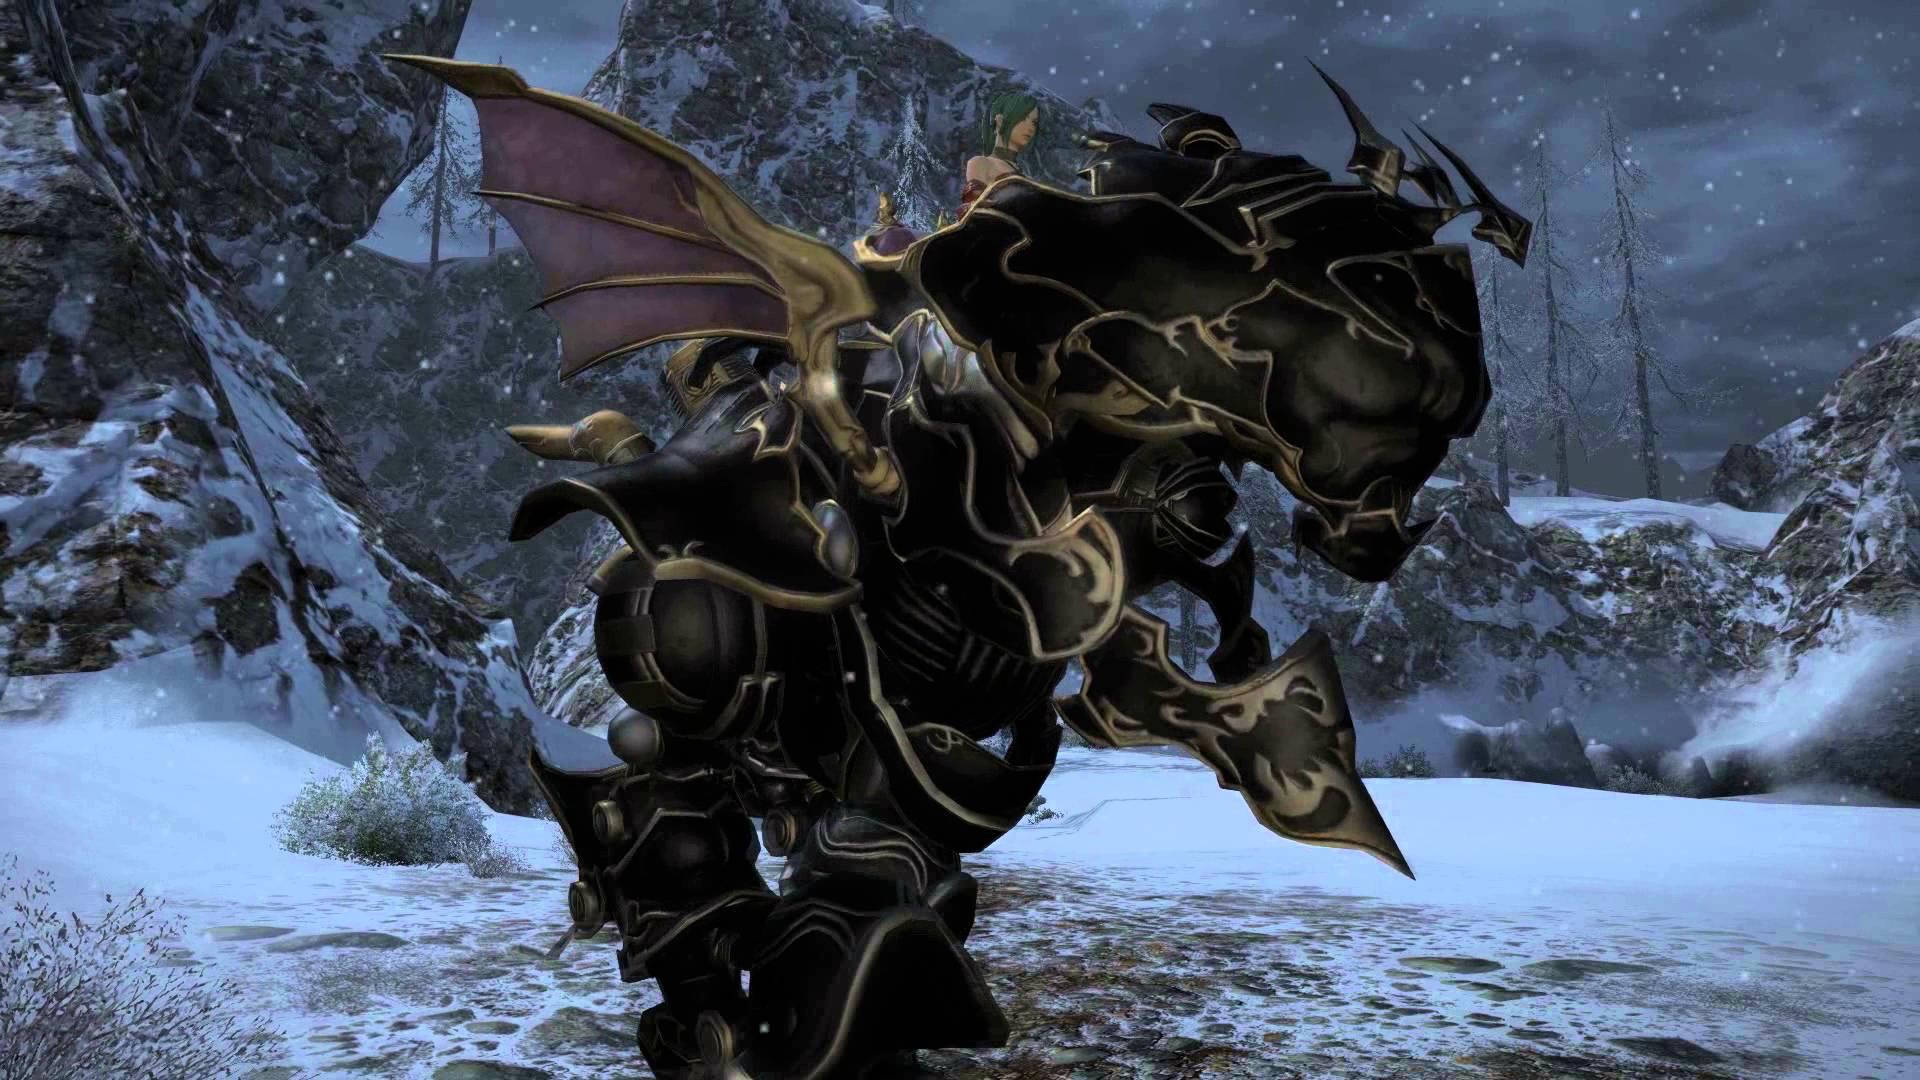 Final Fantasy XIV allusions/Final Fantasy series